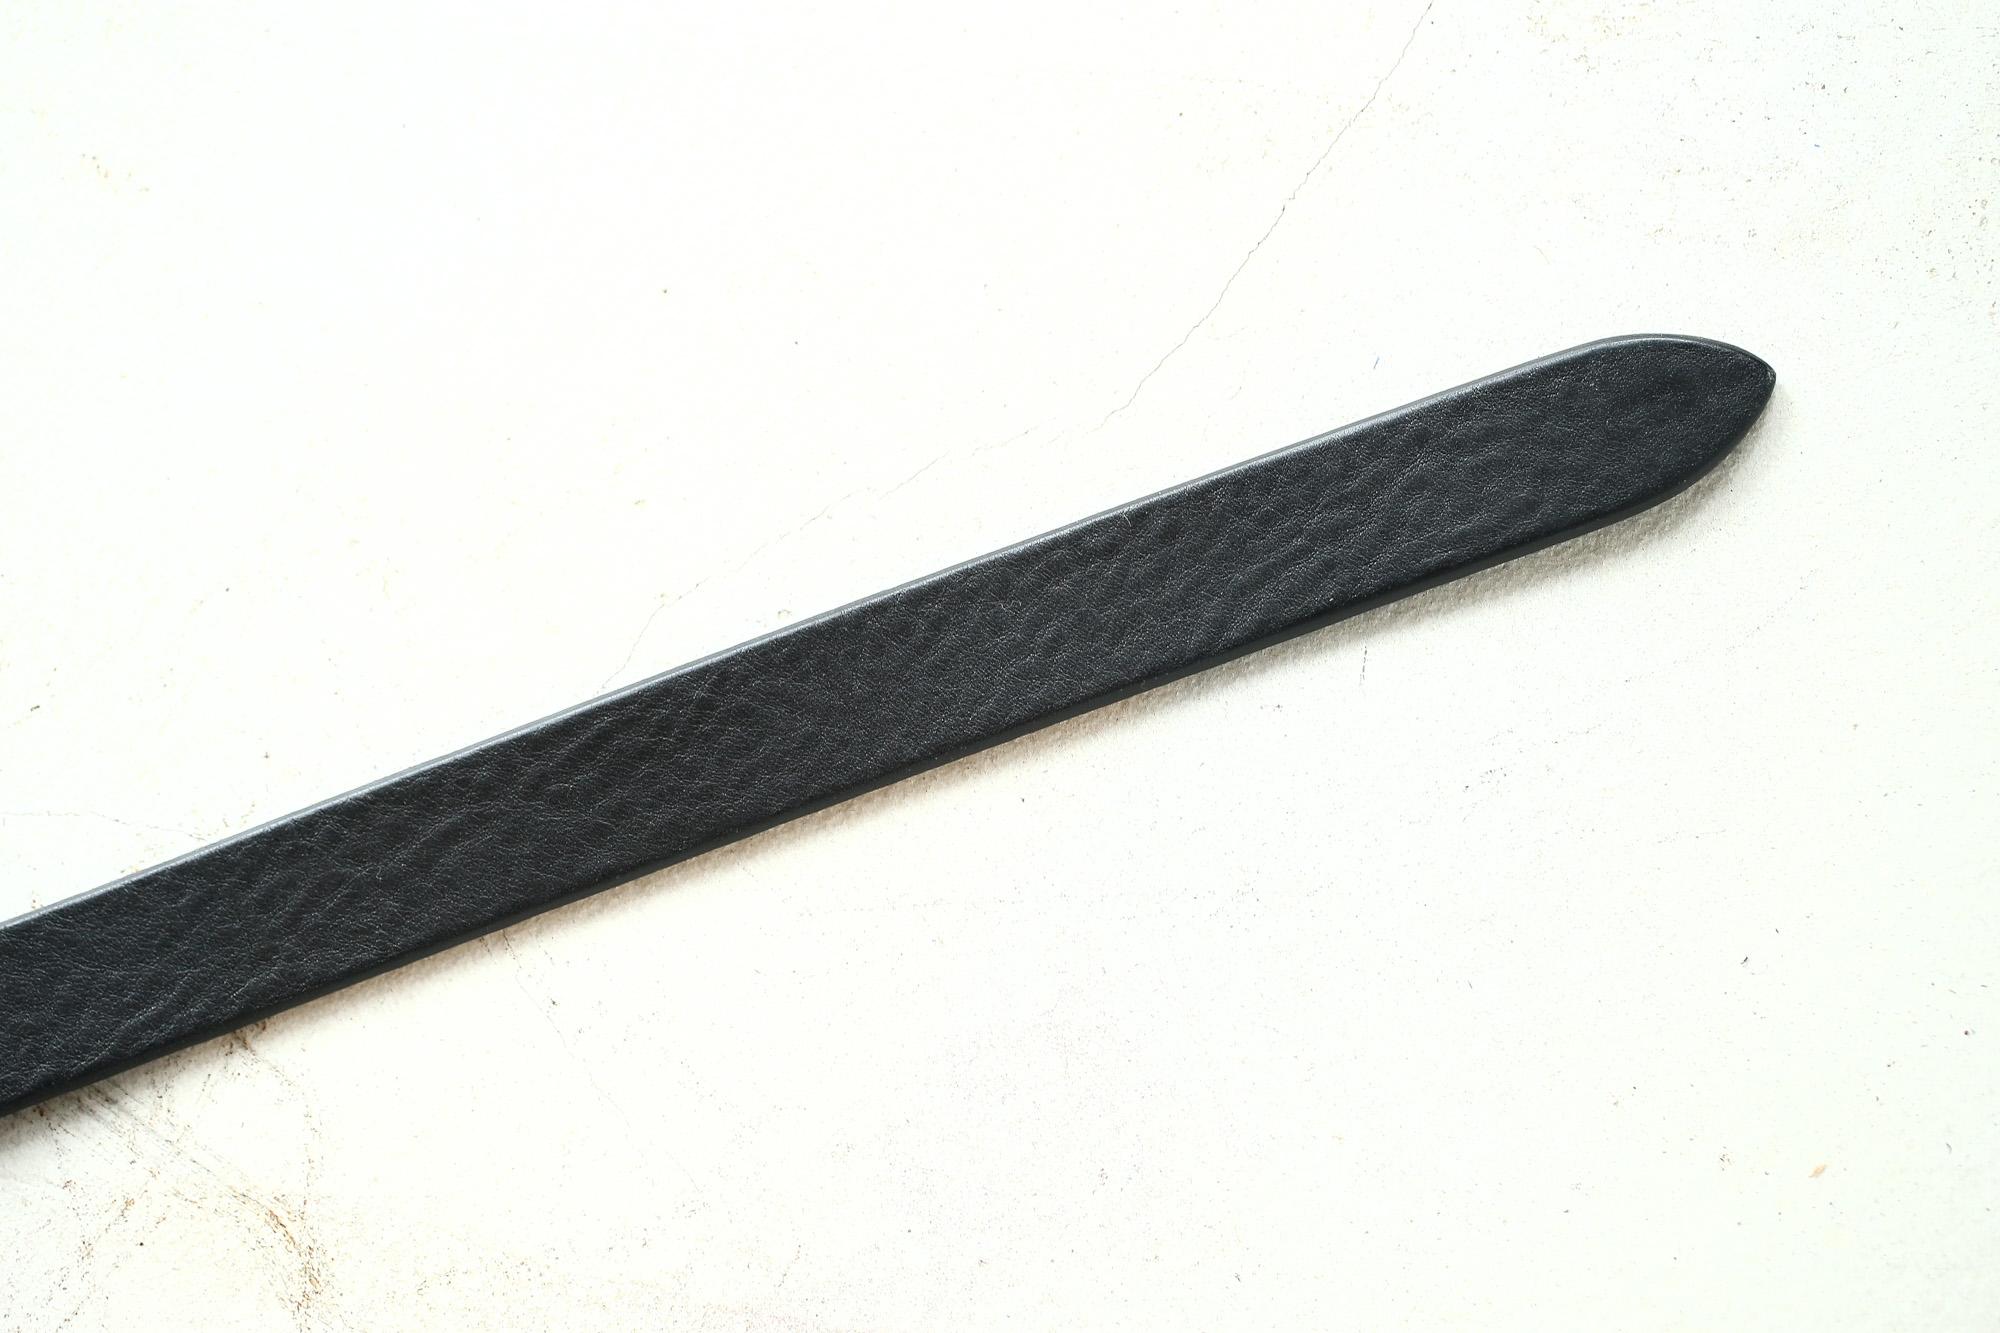 J&M DAVIDSON (ジェイアンドエムデヴィッドソン) DOME RIVETS NARROW BELT 25MM NICKEL-UNLINED (ドーム リベット ナローベルト 25mm) COWHIDE LEATHER (カウハイドレザー) スタッズベルト BLACK (ブラック・999) Made in italy (イタリア製) 2018 春夏新作 jandmdavidson jmdavidson 愛知 名古屋 ZODIAC ゾディアック ベルト ジェイエム